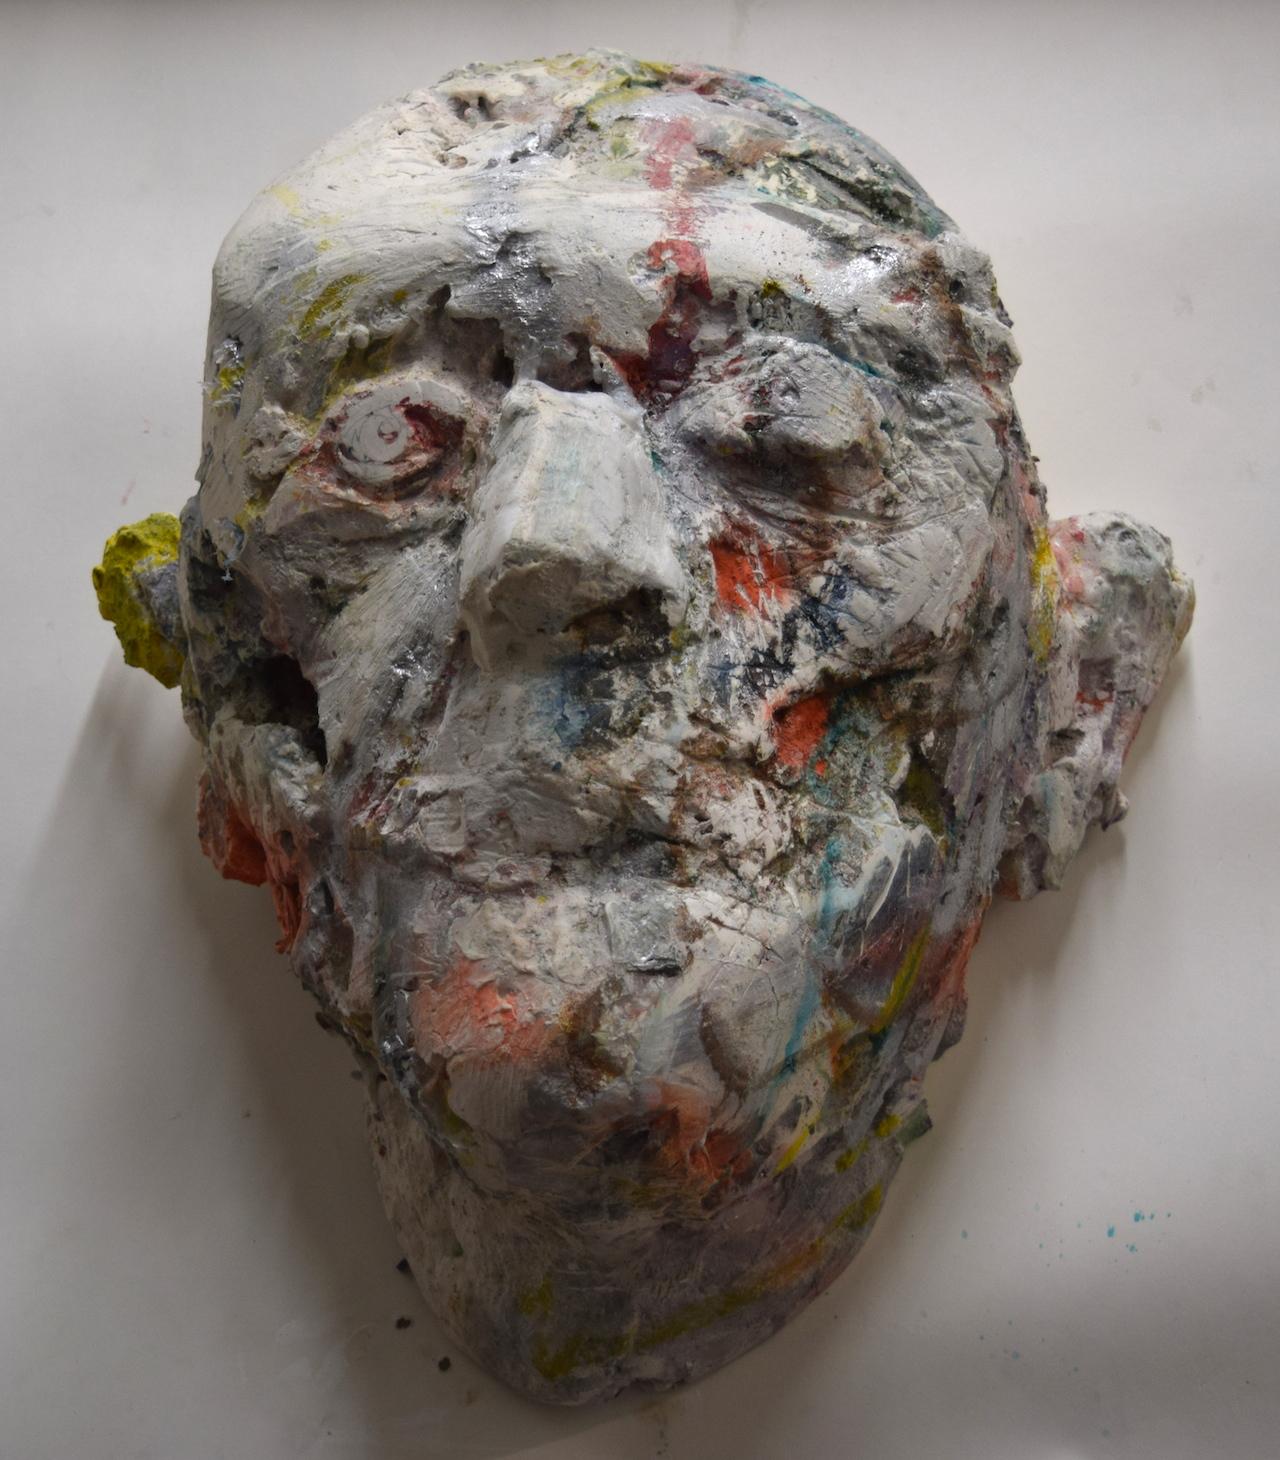 A sculpture by Amy Derek Weisberg in his studio (#327) at 1717 Troutman